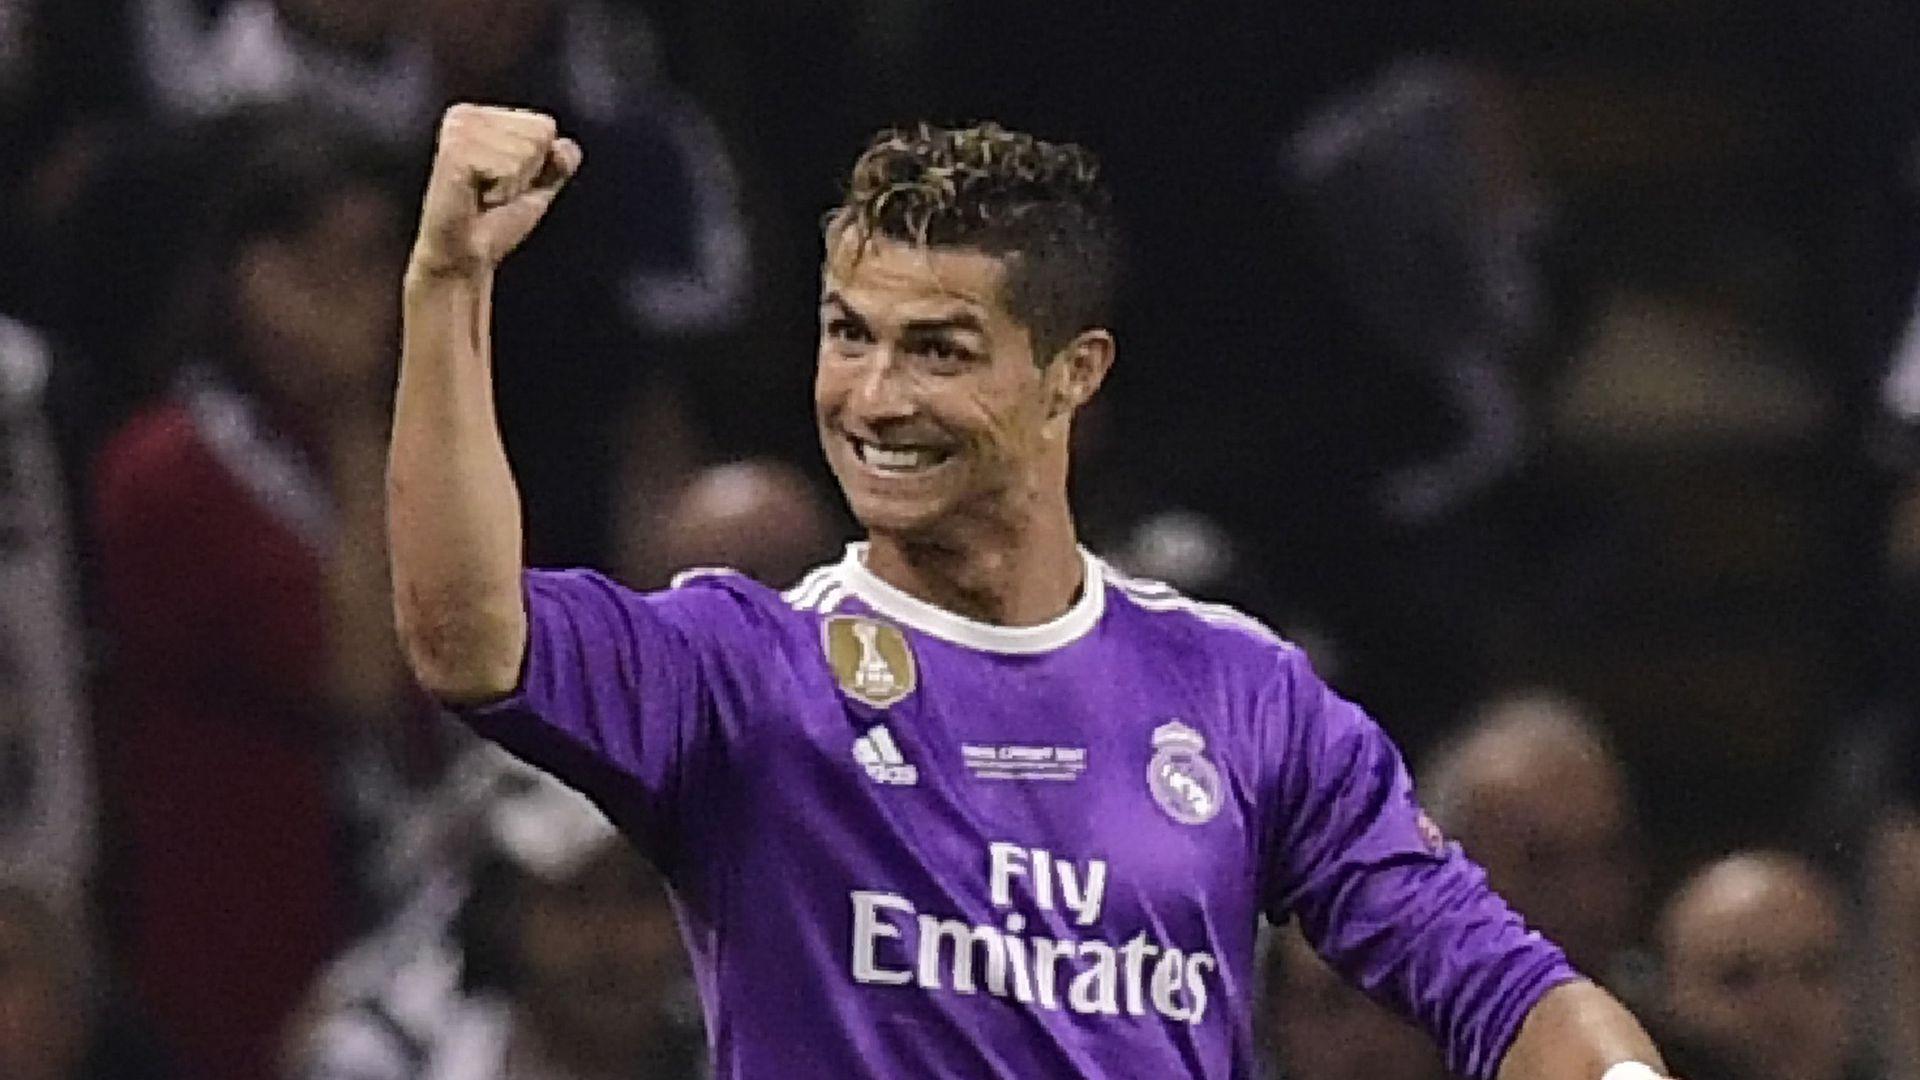 Leihmutter Zwillinge Cristiano Ronaldo Zum 2 Mal Vater